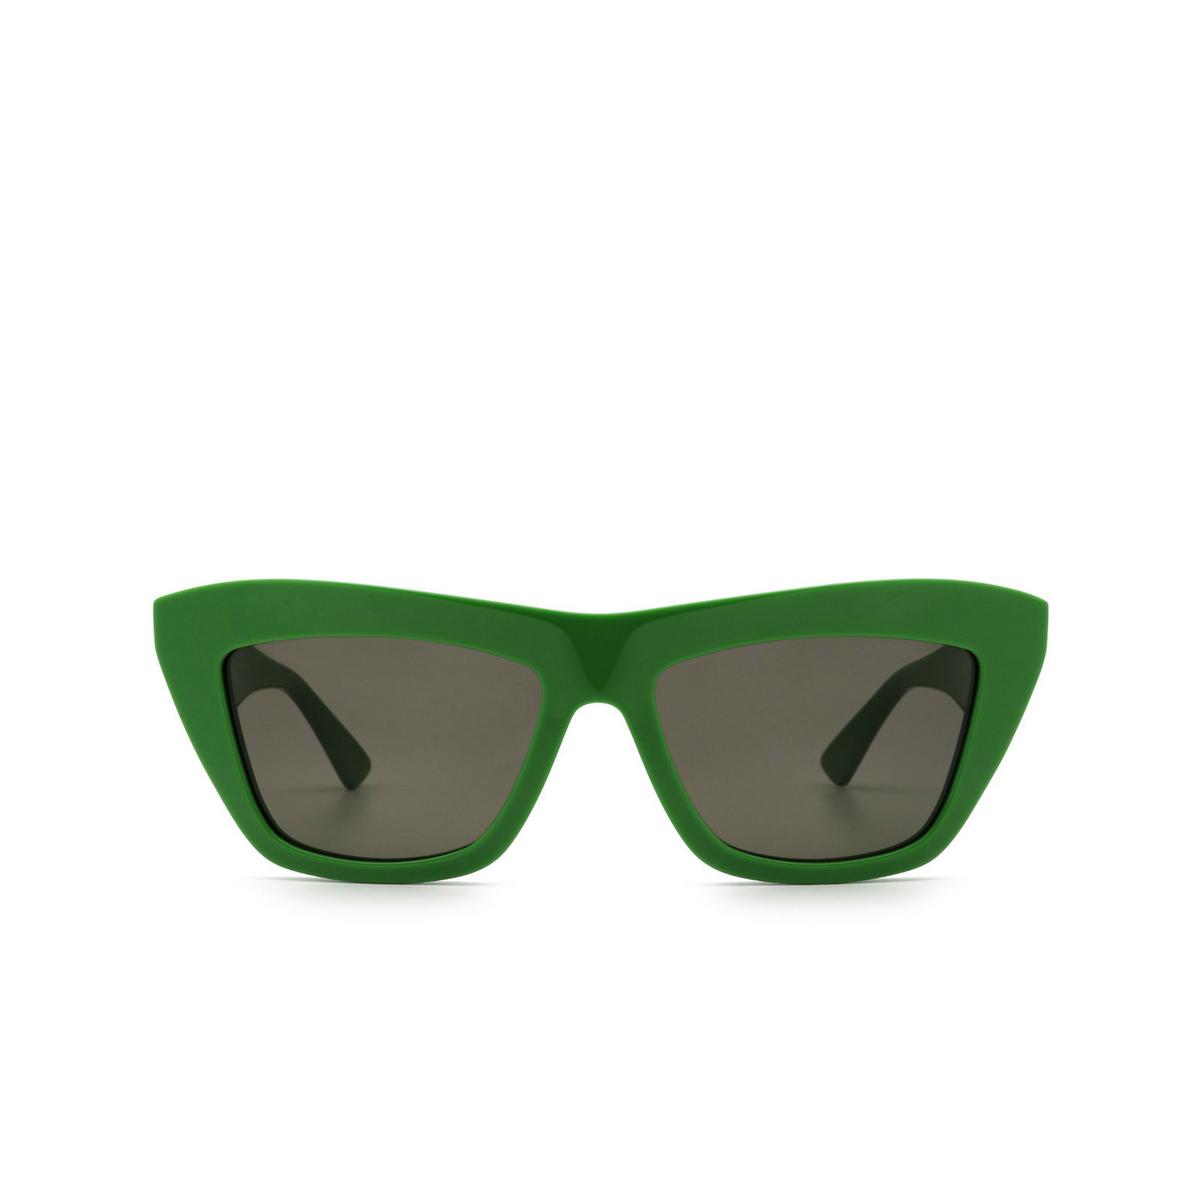 Bottega Veneta® Cat-eye Sunglasses: BV1121S color Green 005 - front view.